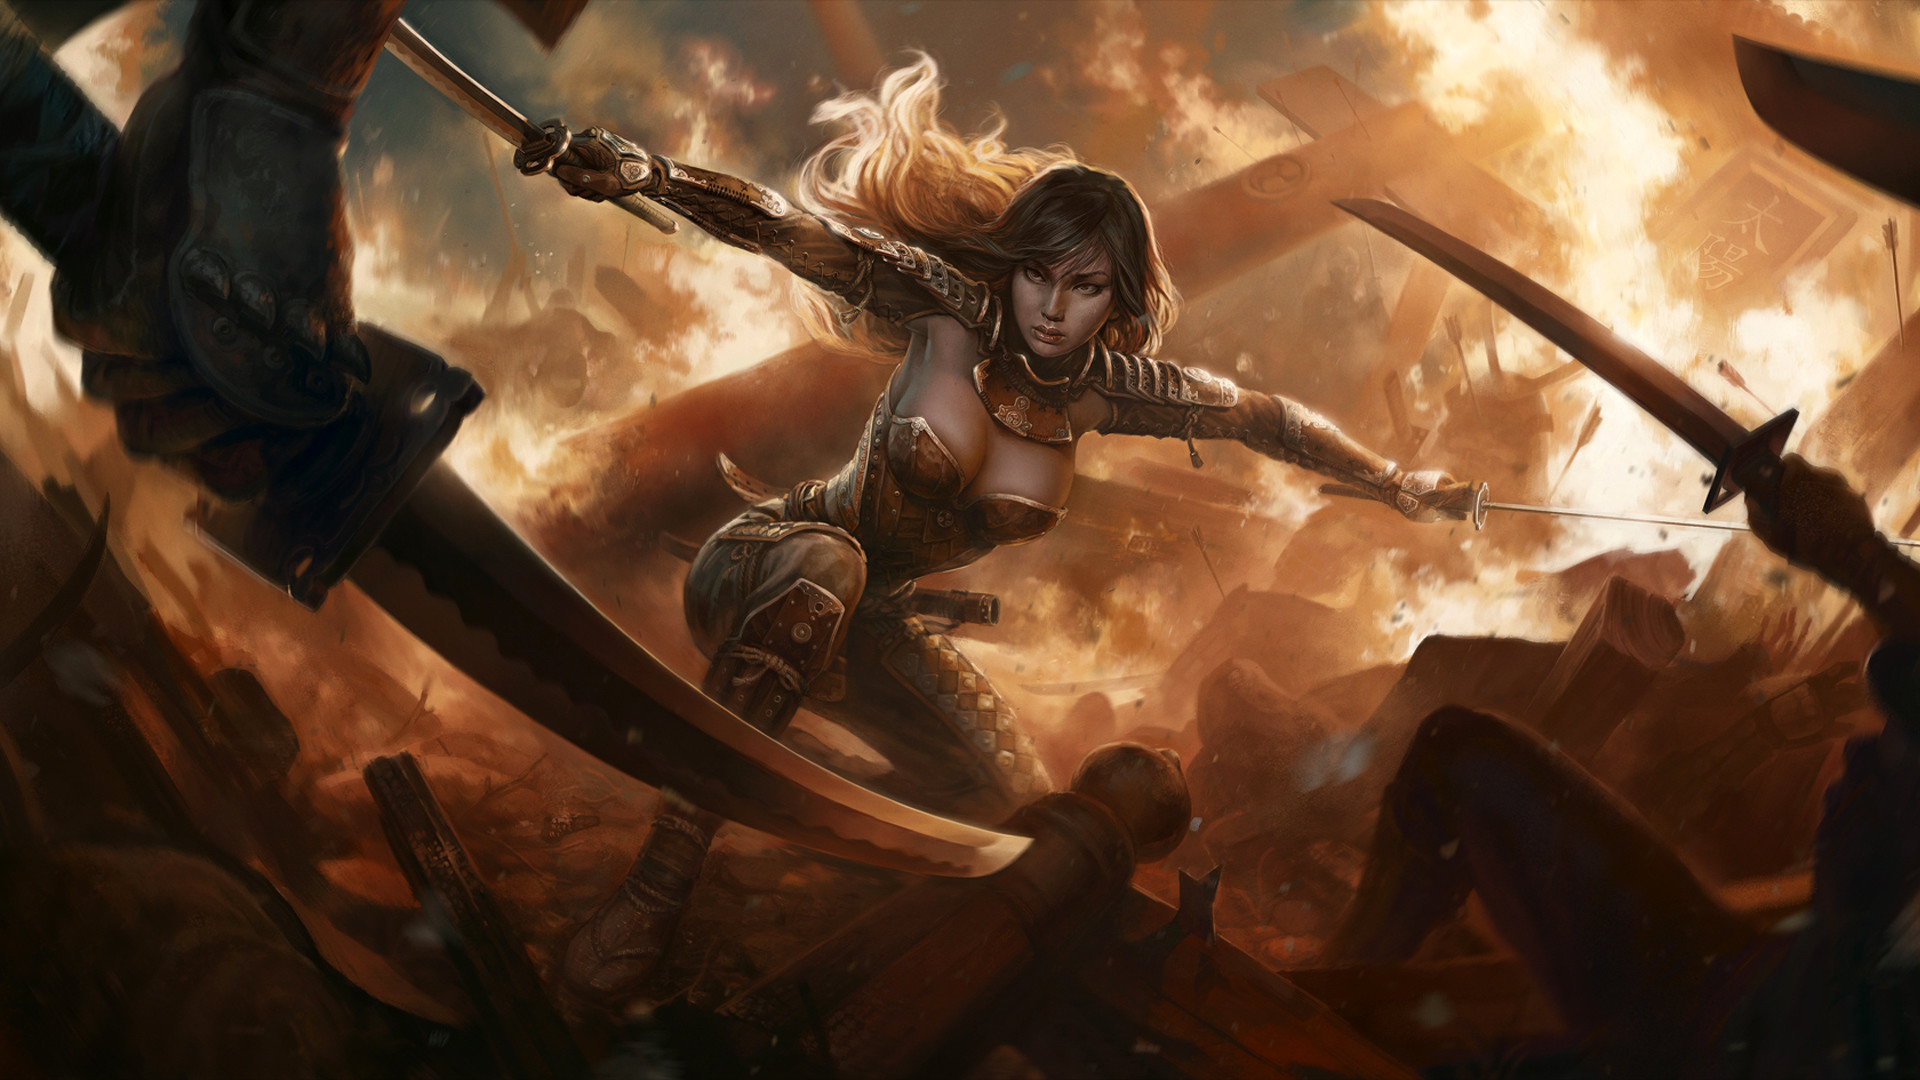 Fantasy Female Warrior Wallpapers